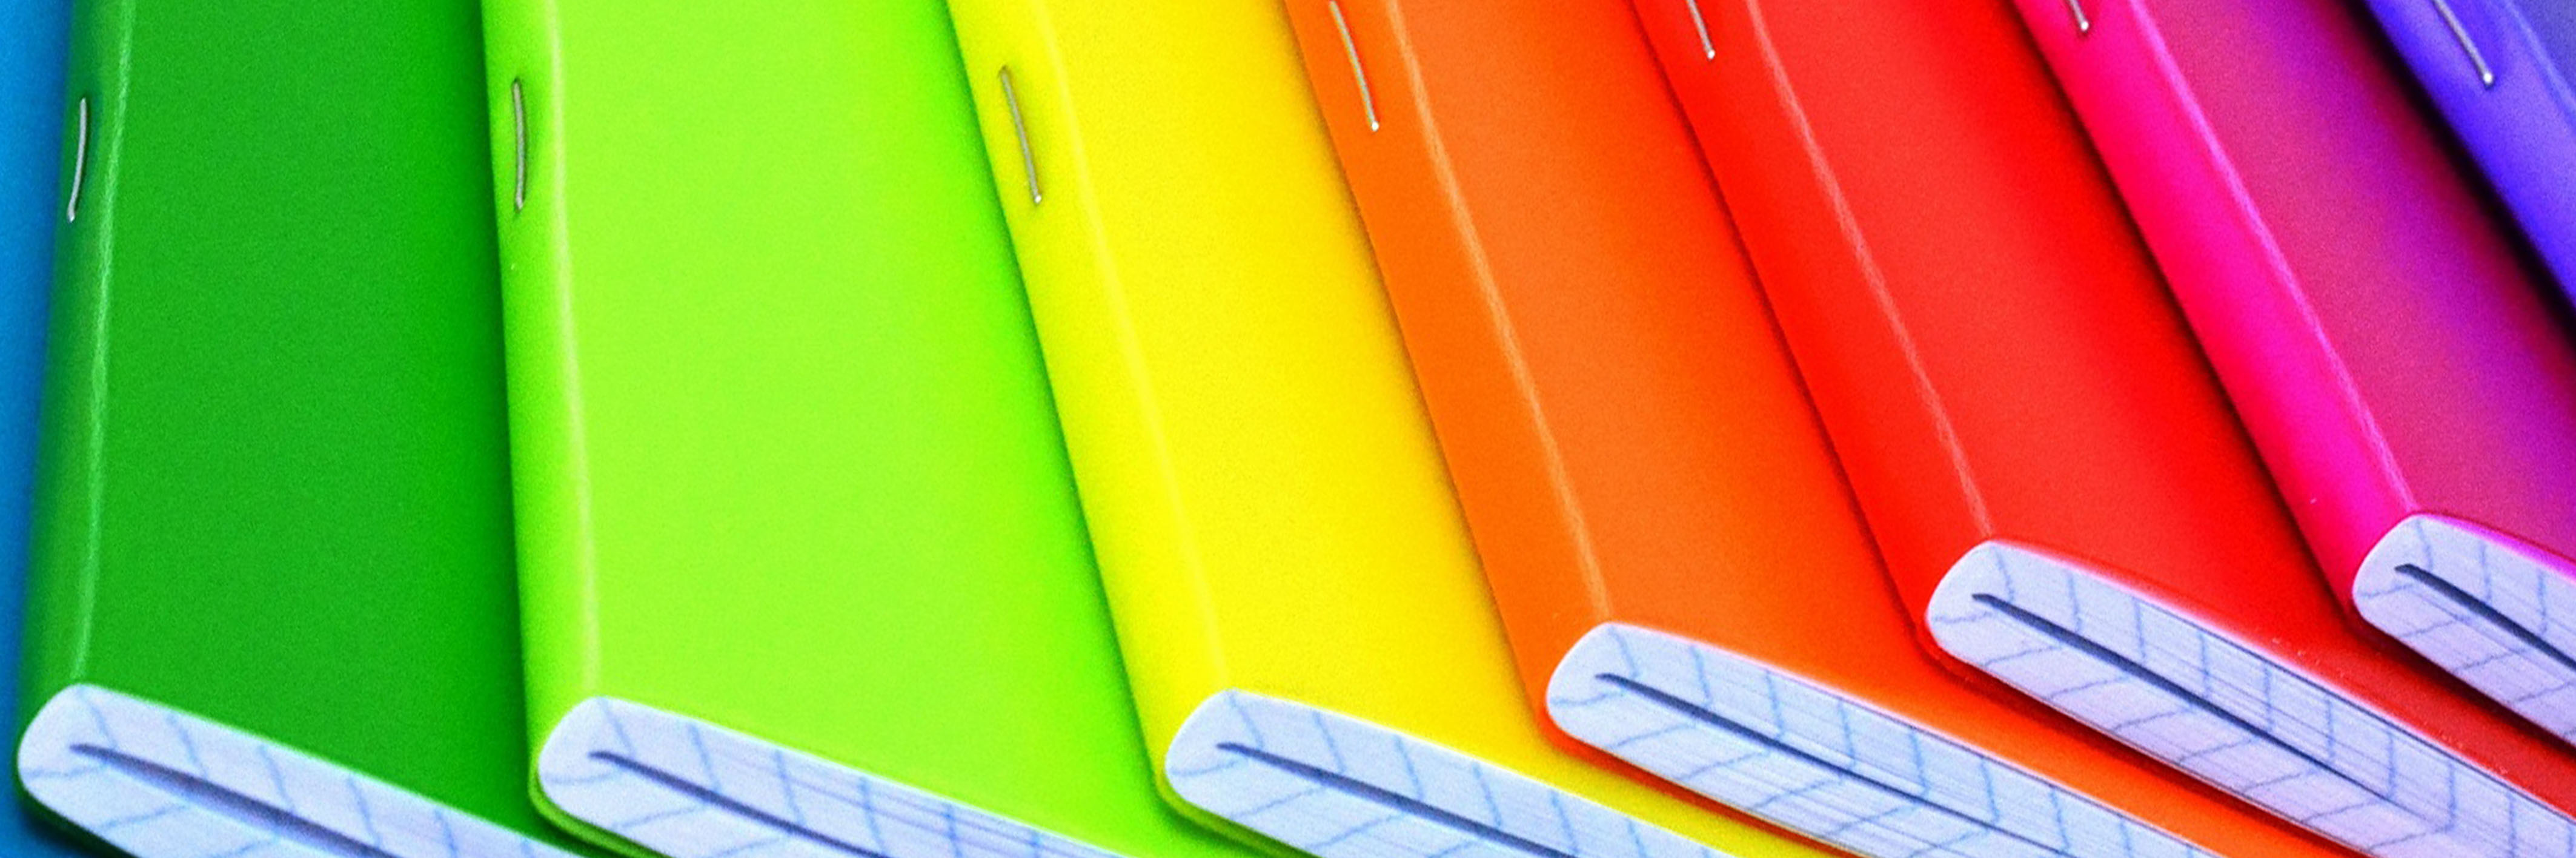 colour_books_background